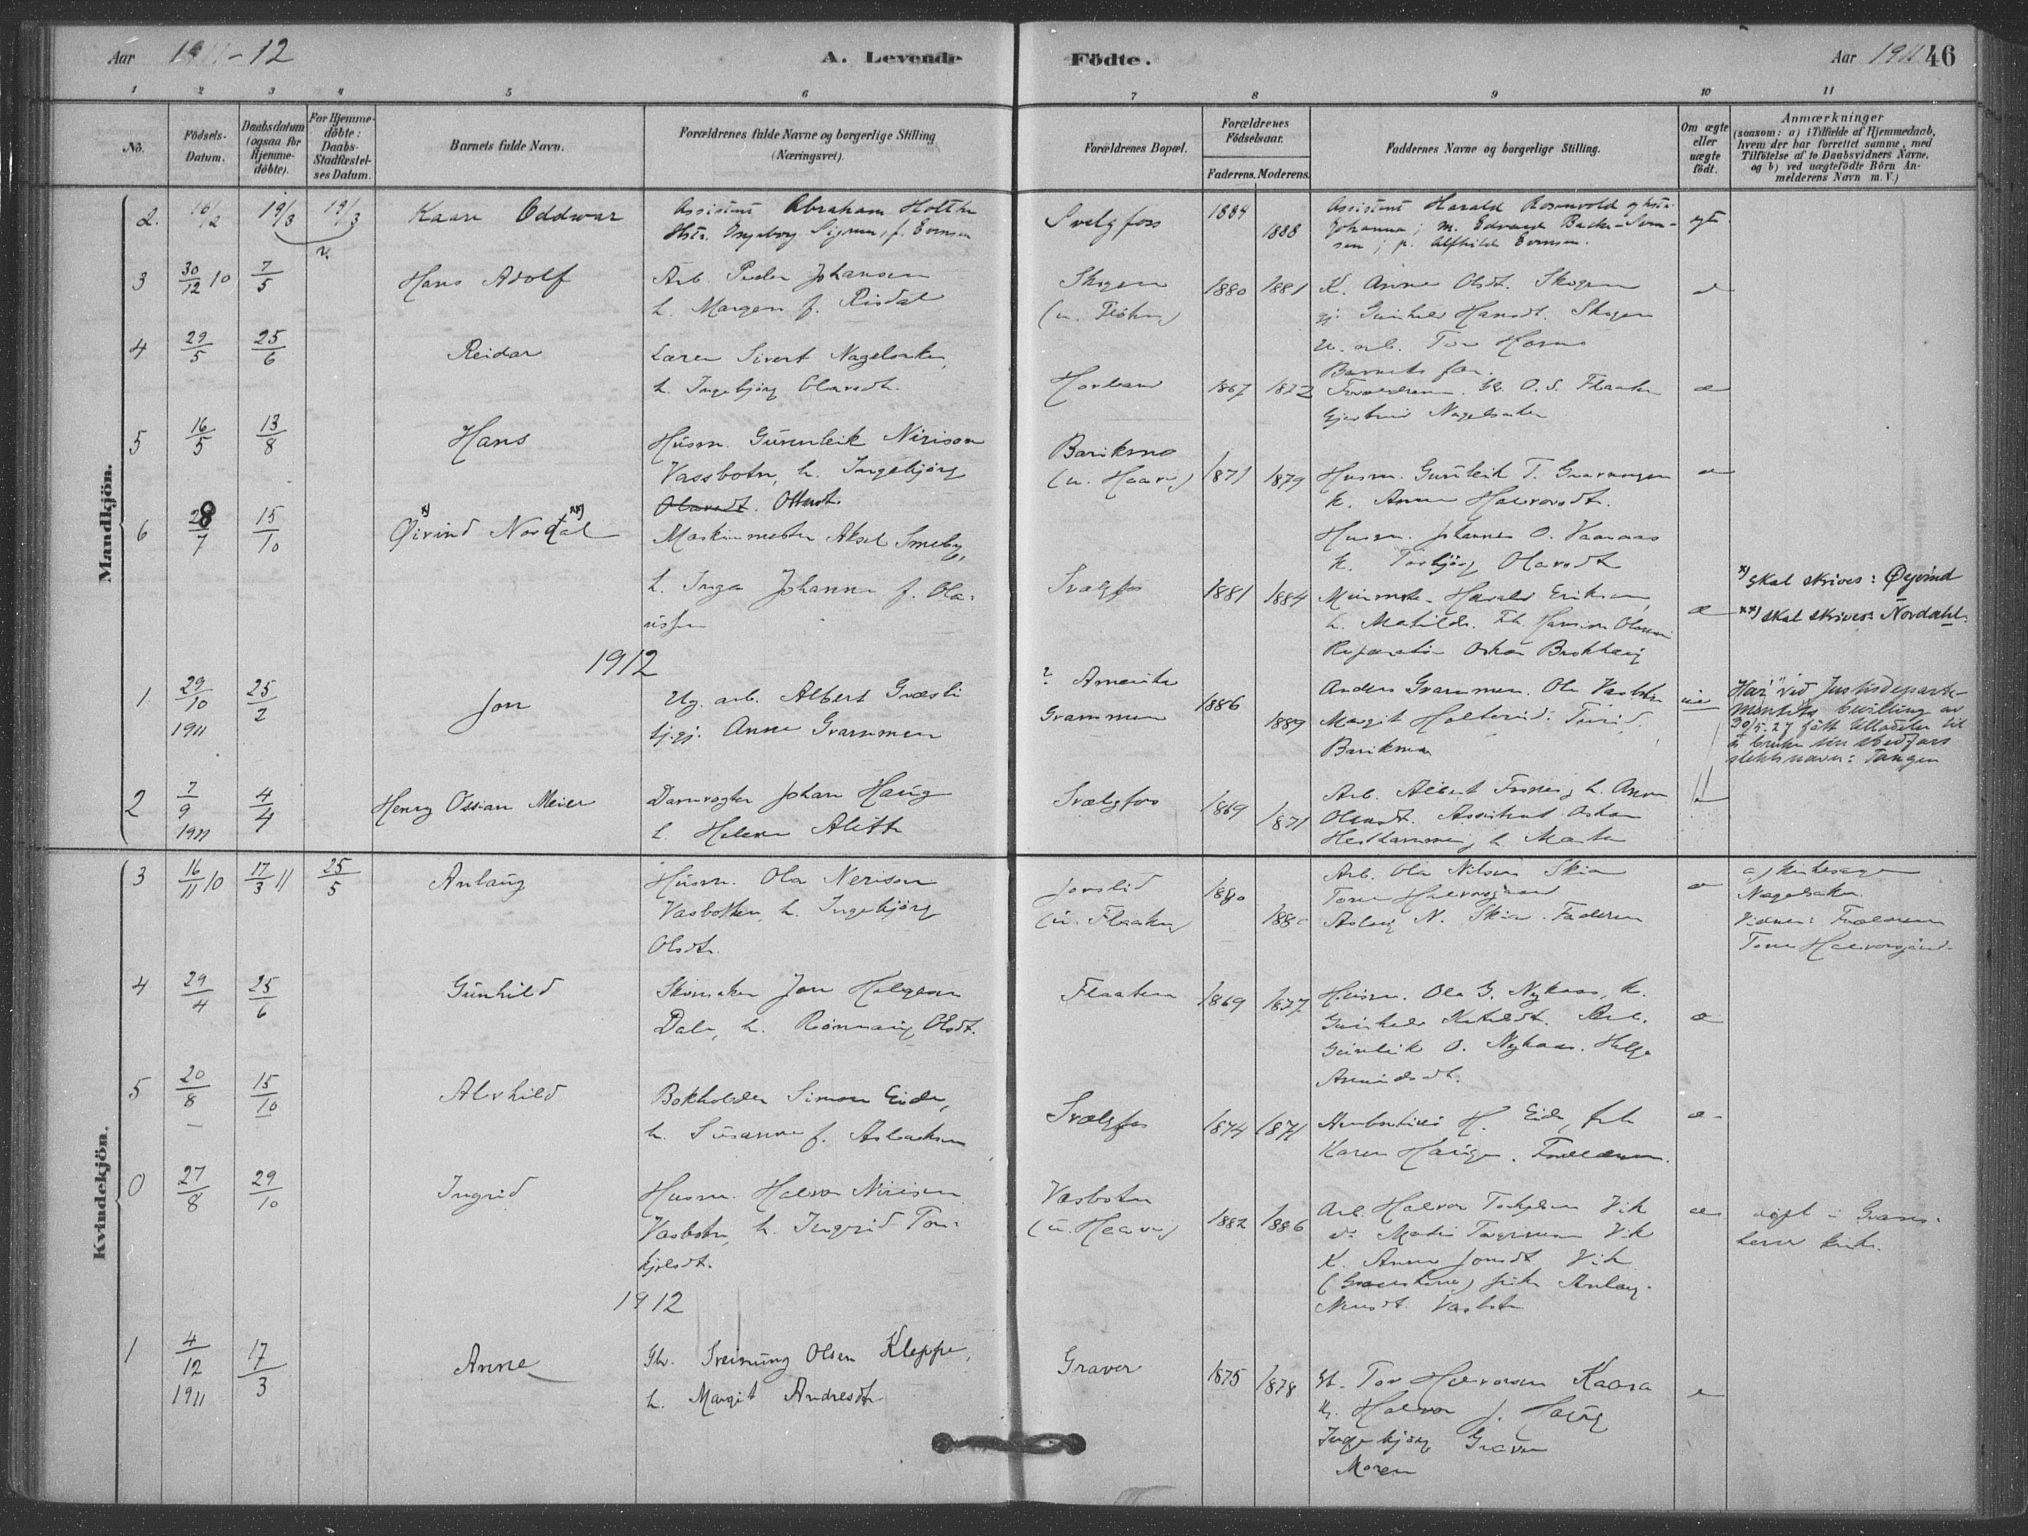 SAKO, Heddal kirkebøker, F/Fb/L0002: Ministerialbok nr. II 2, 1878-1913, s. 46